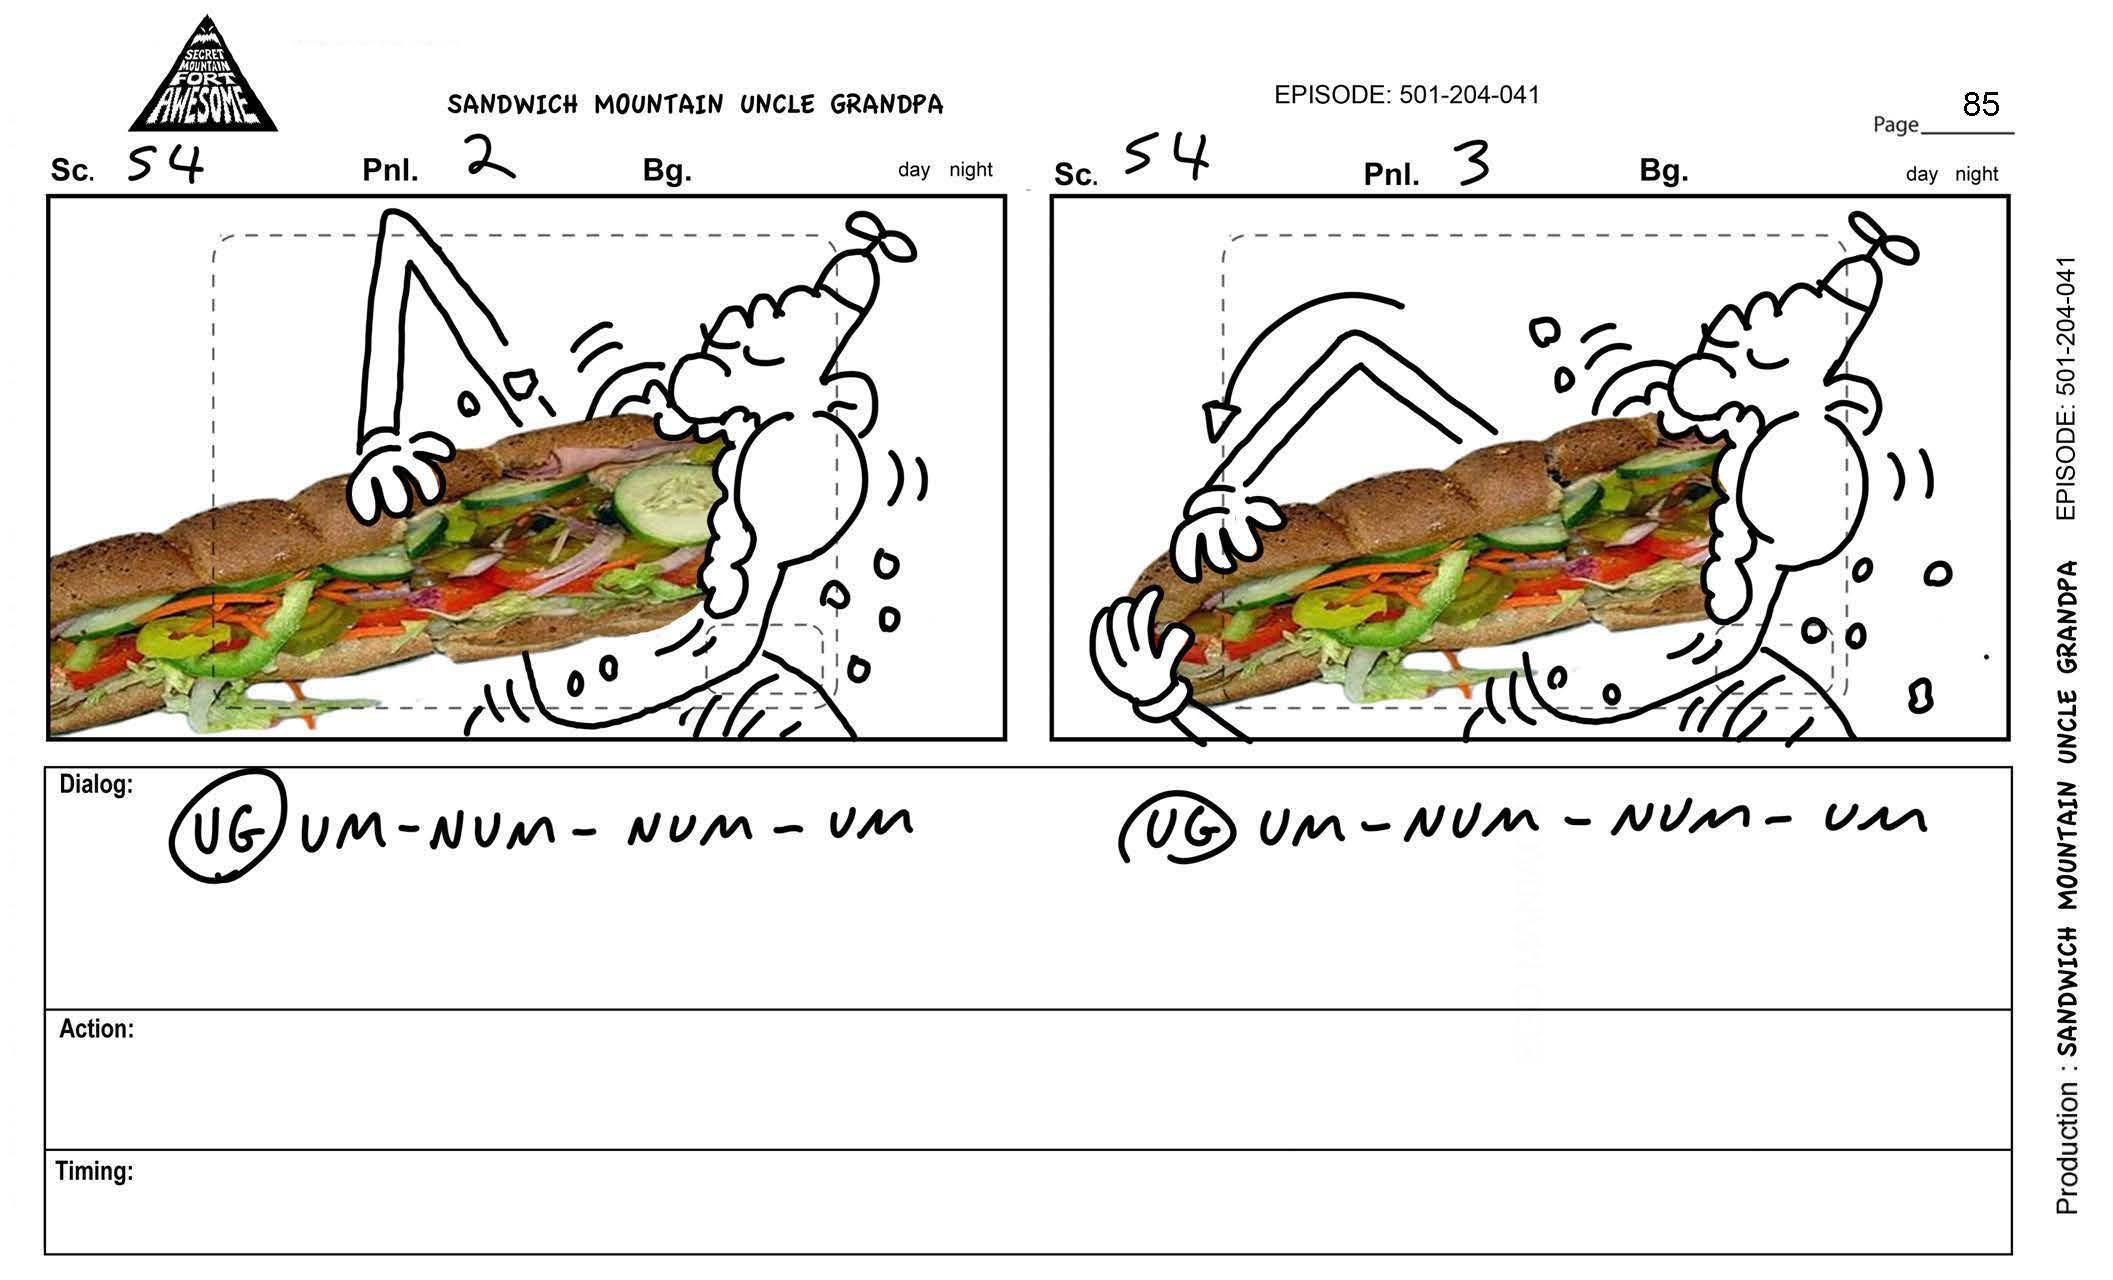 SMFA_SandwichMountainUncleGrandpa_Page_085.jpg